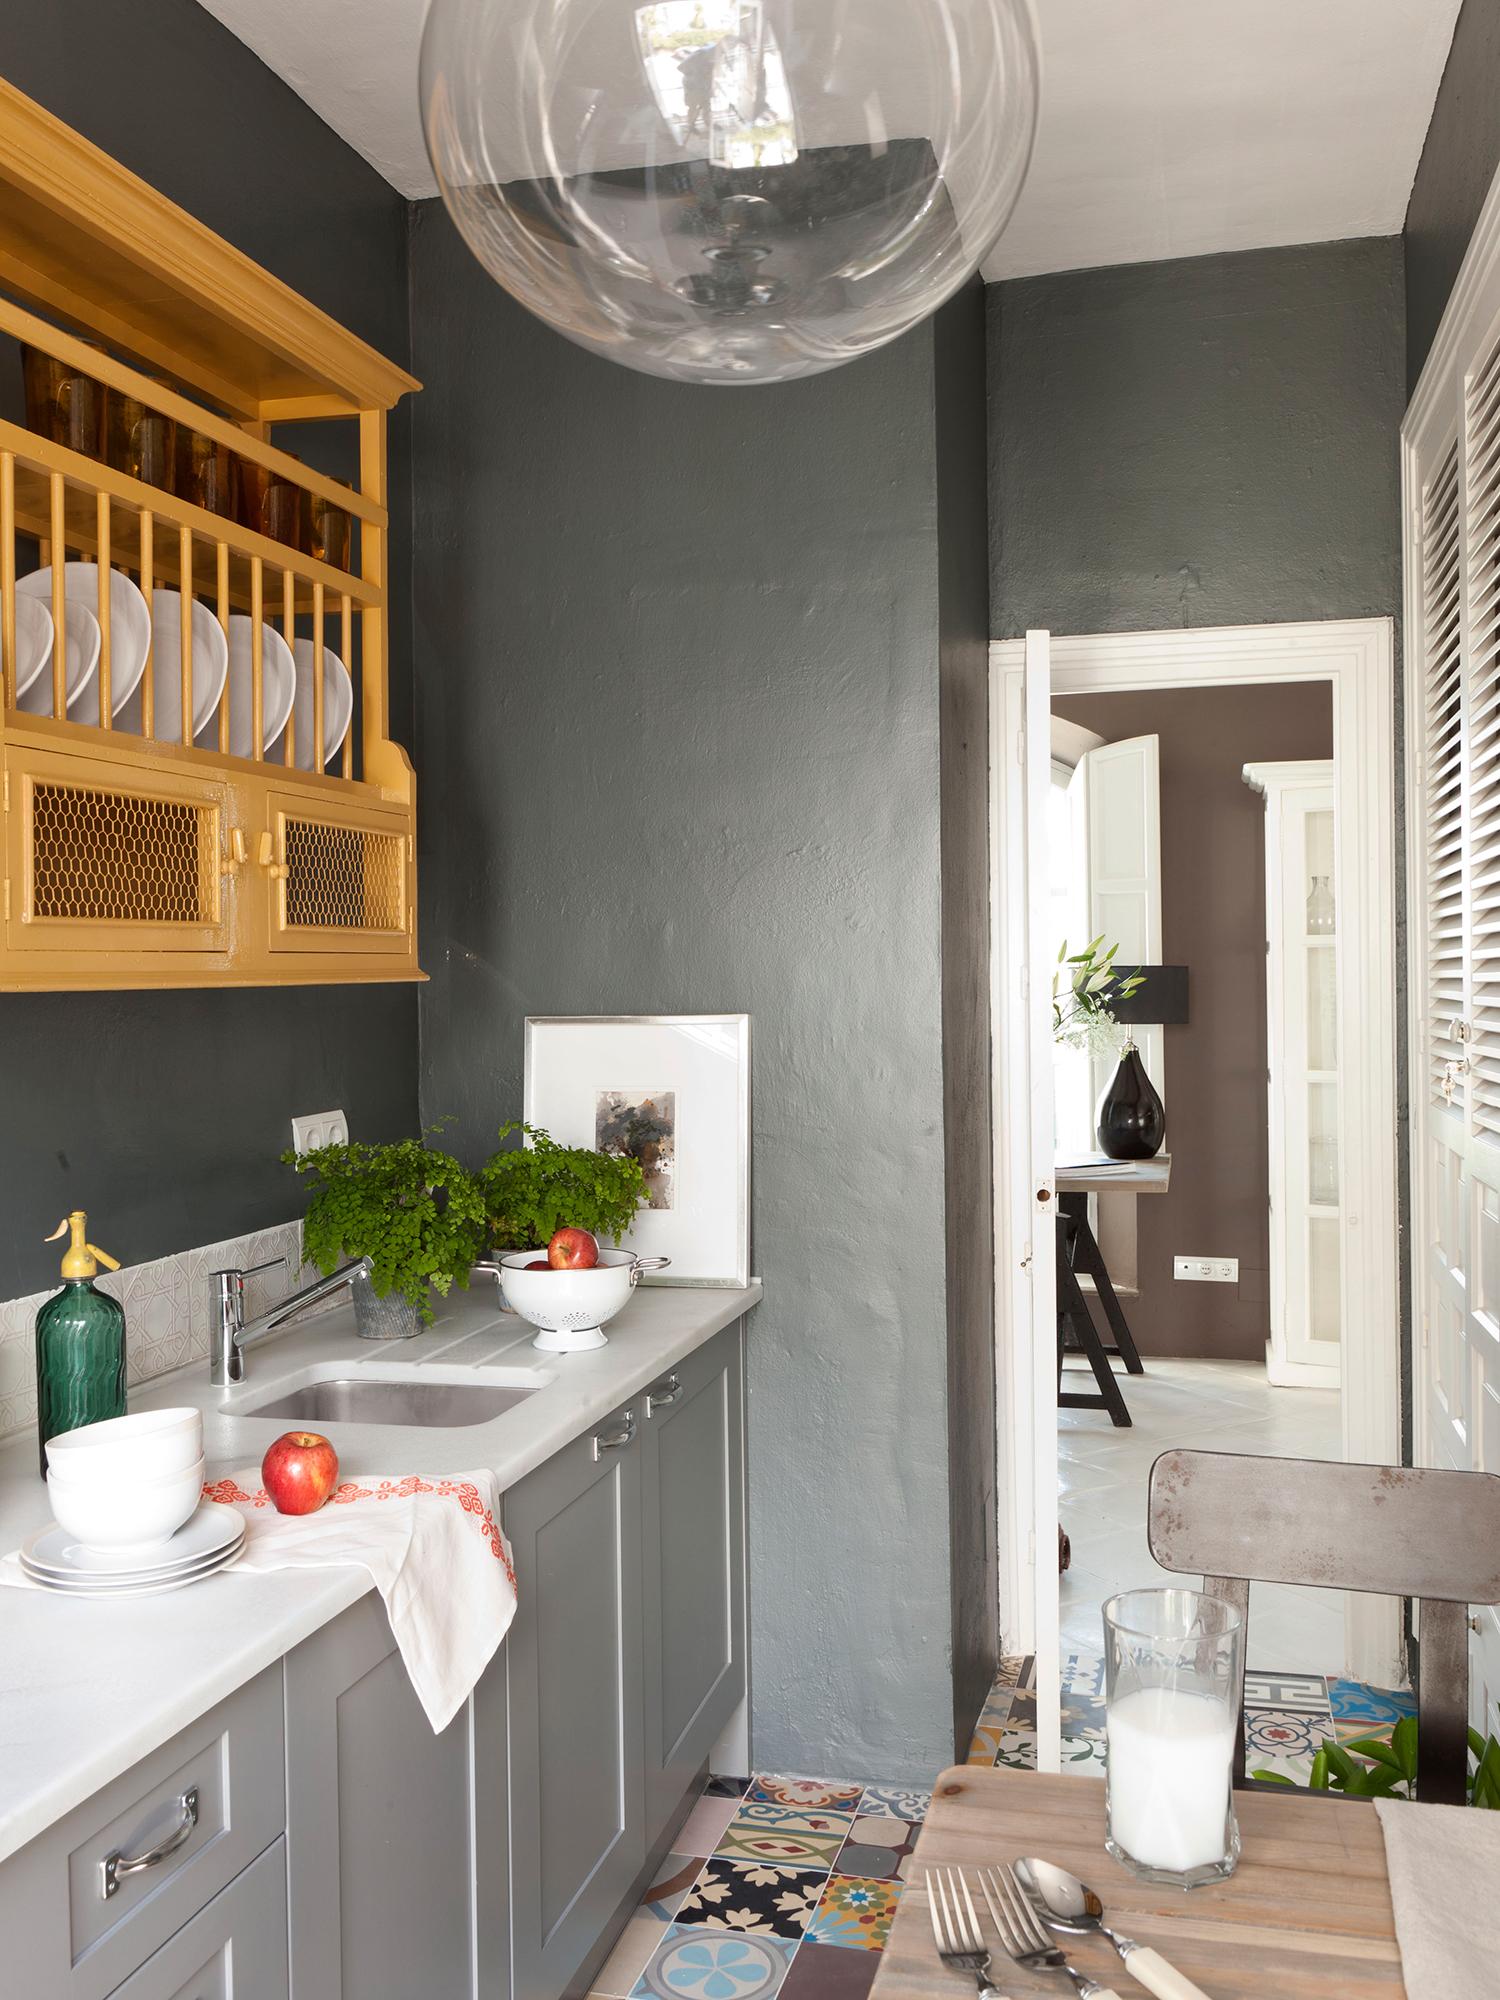 Cocinas peque as distribuidas en paralelo - Muebles grises paredes color ...